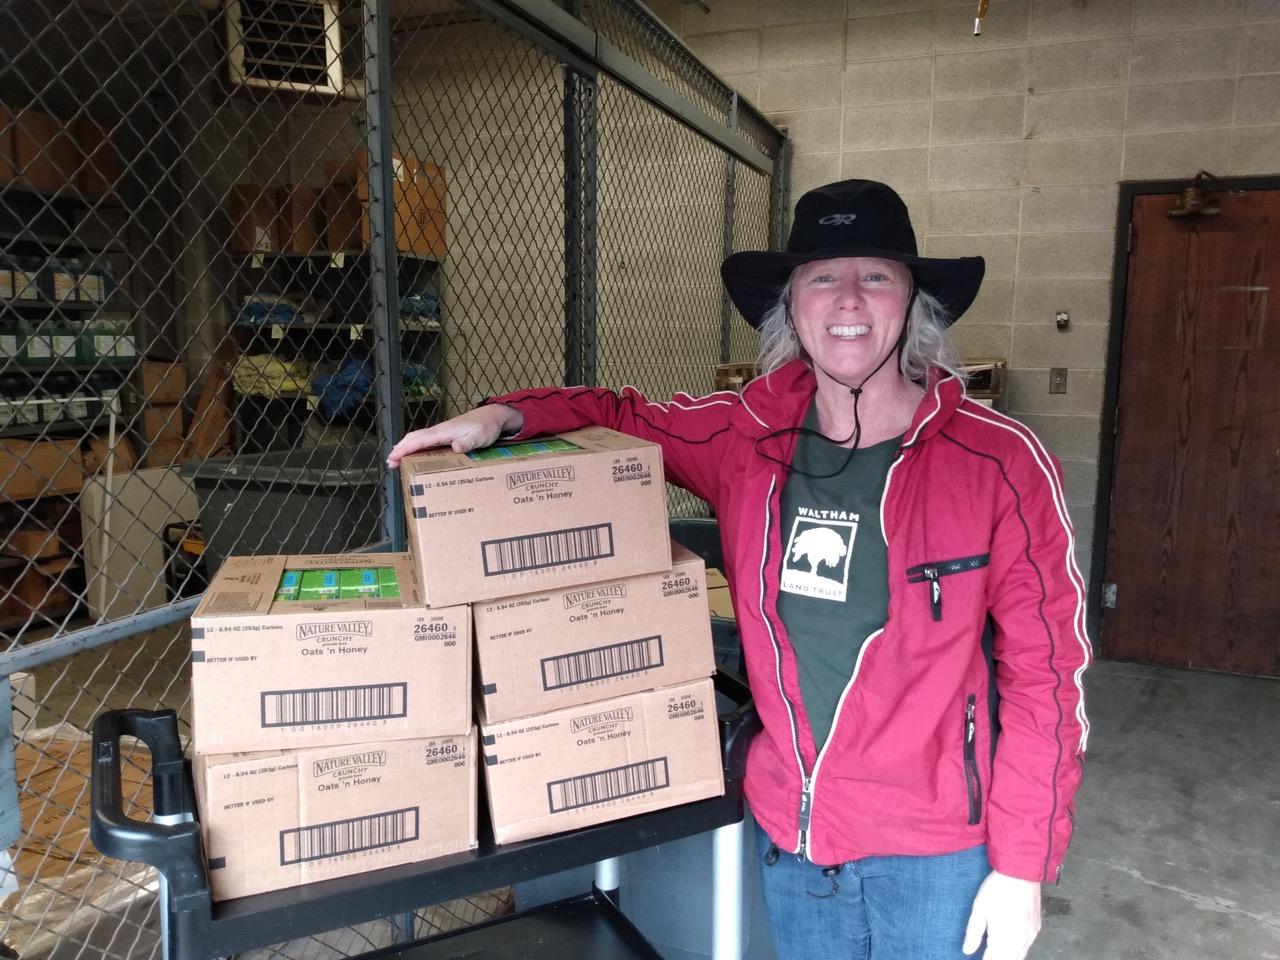 Sonja Brings Cases to H.S. Loading Dock (1)